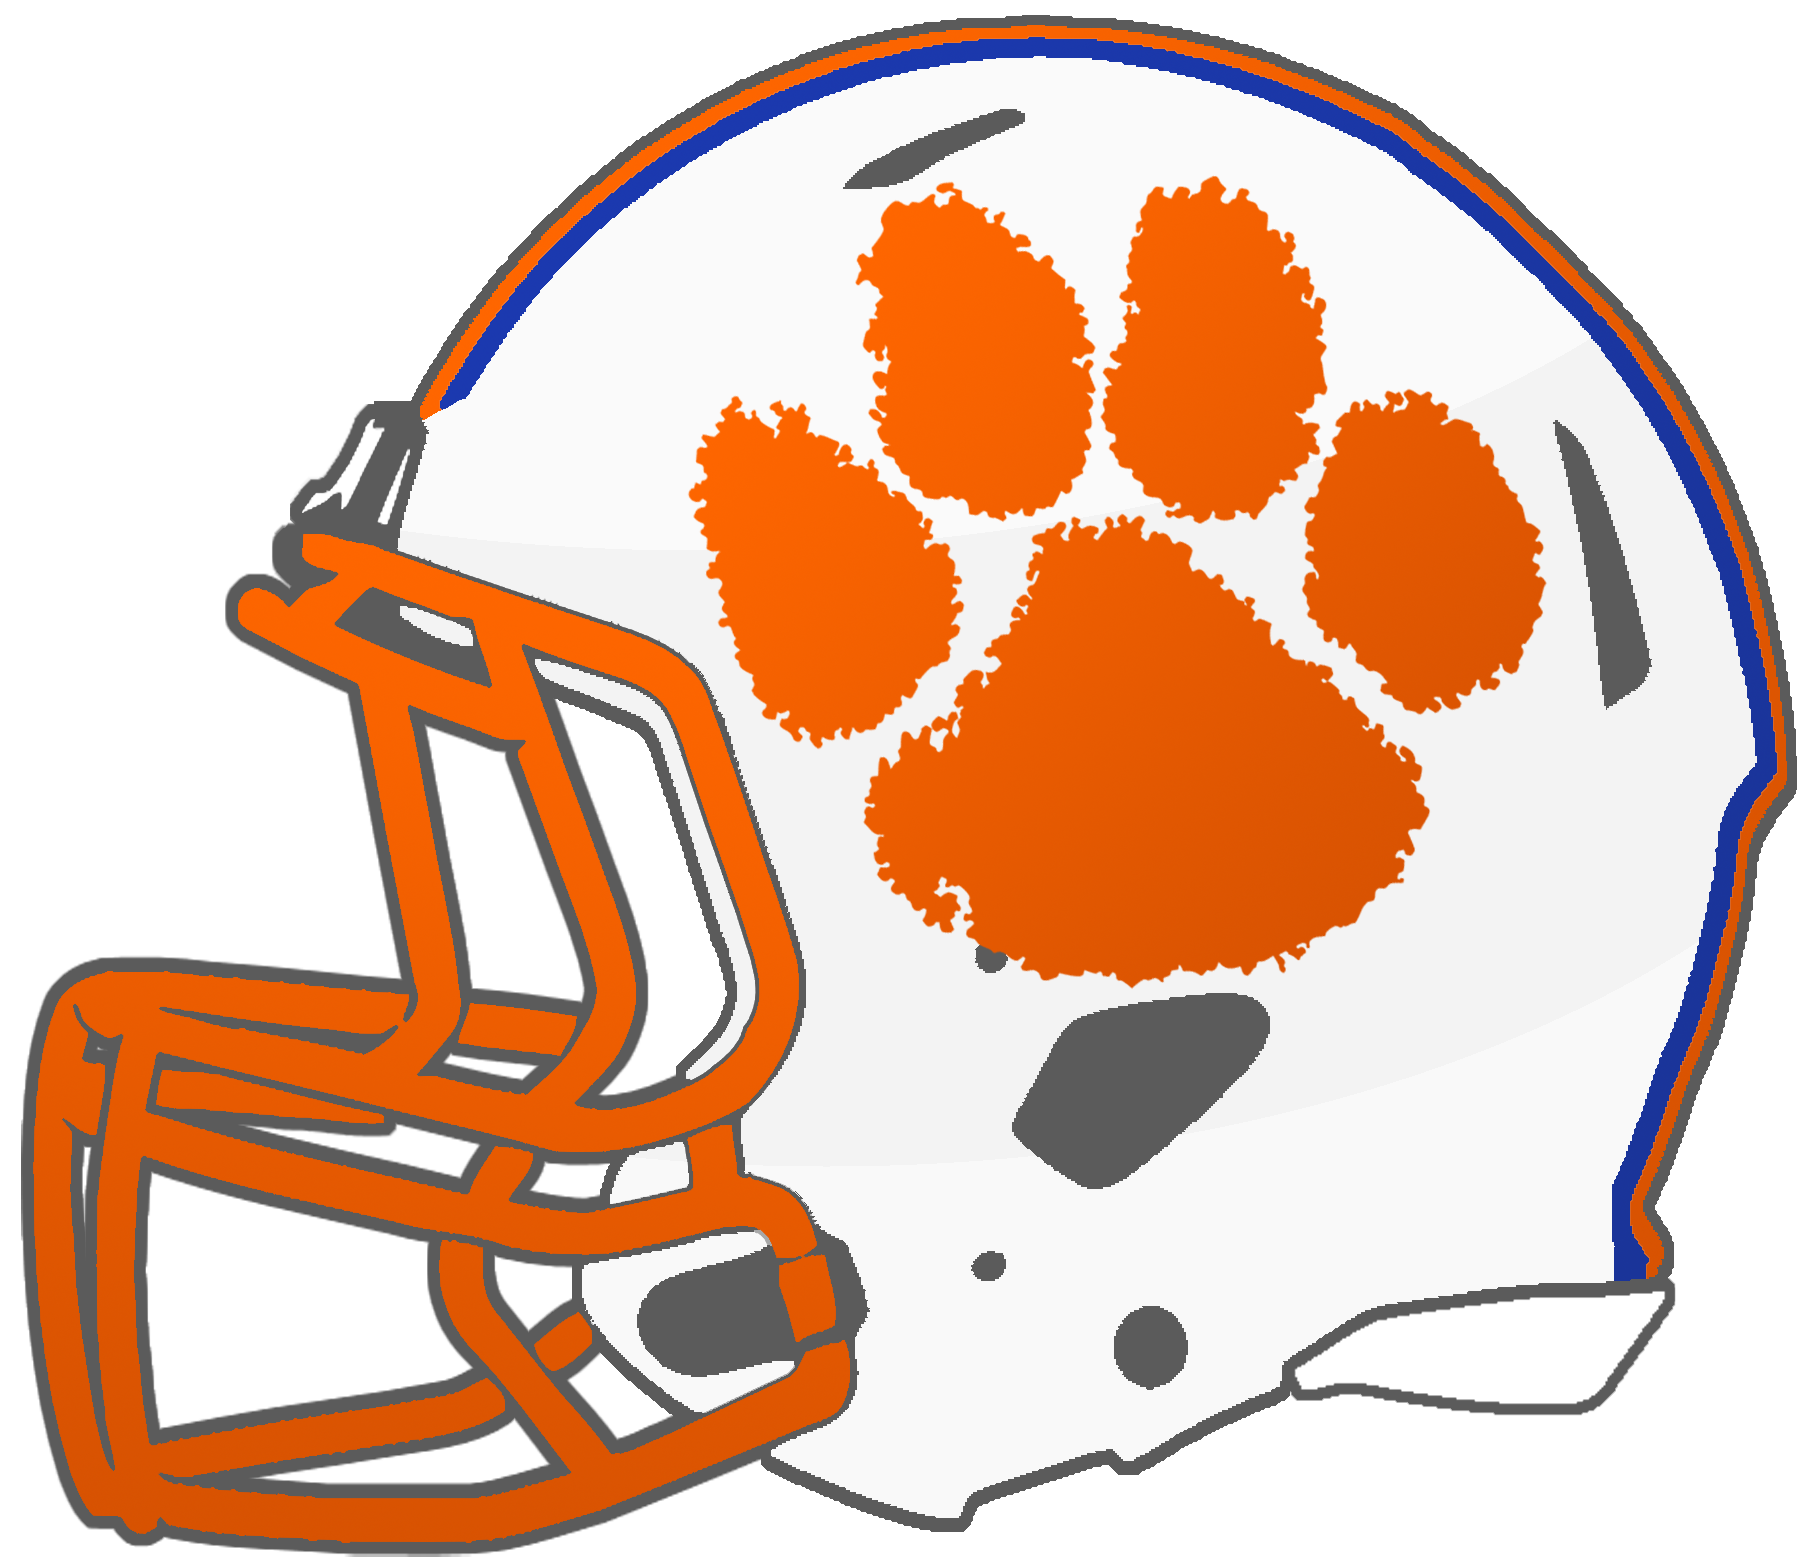 Hornet clipart greenville. Mississippi high school football